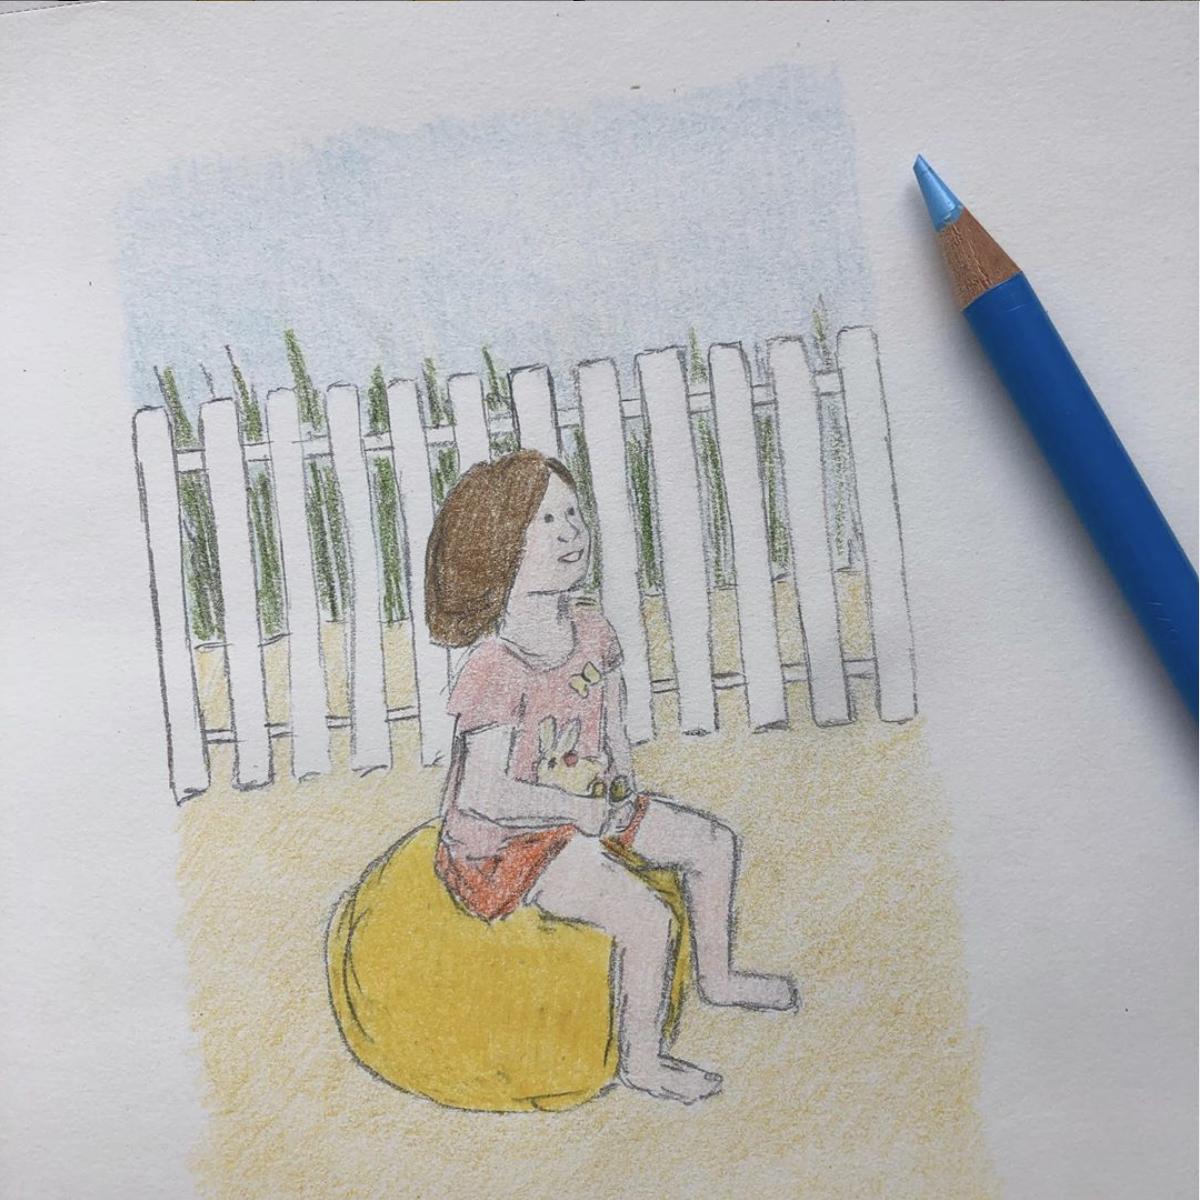 Dessin de ma fille à la plage avec un ballon sauteur / Zeichnung von meiner Tochter am Strand auf einem Hüpfball 🏖 #plage #ete #petitefille #jouer #ballonsauteur #illustration #crayondecouleurs #huepfball #strand #sand #beach #fun #plaisir #spass #illustrationenfant